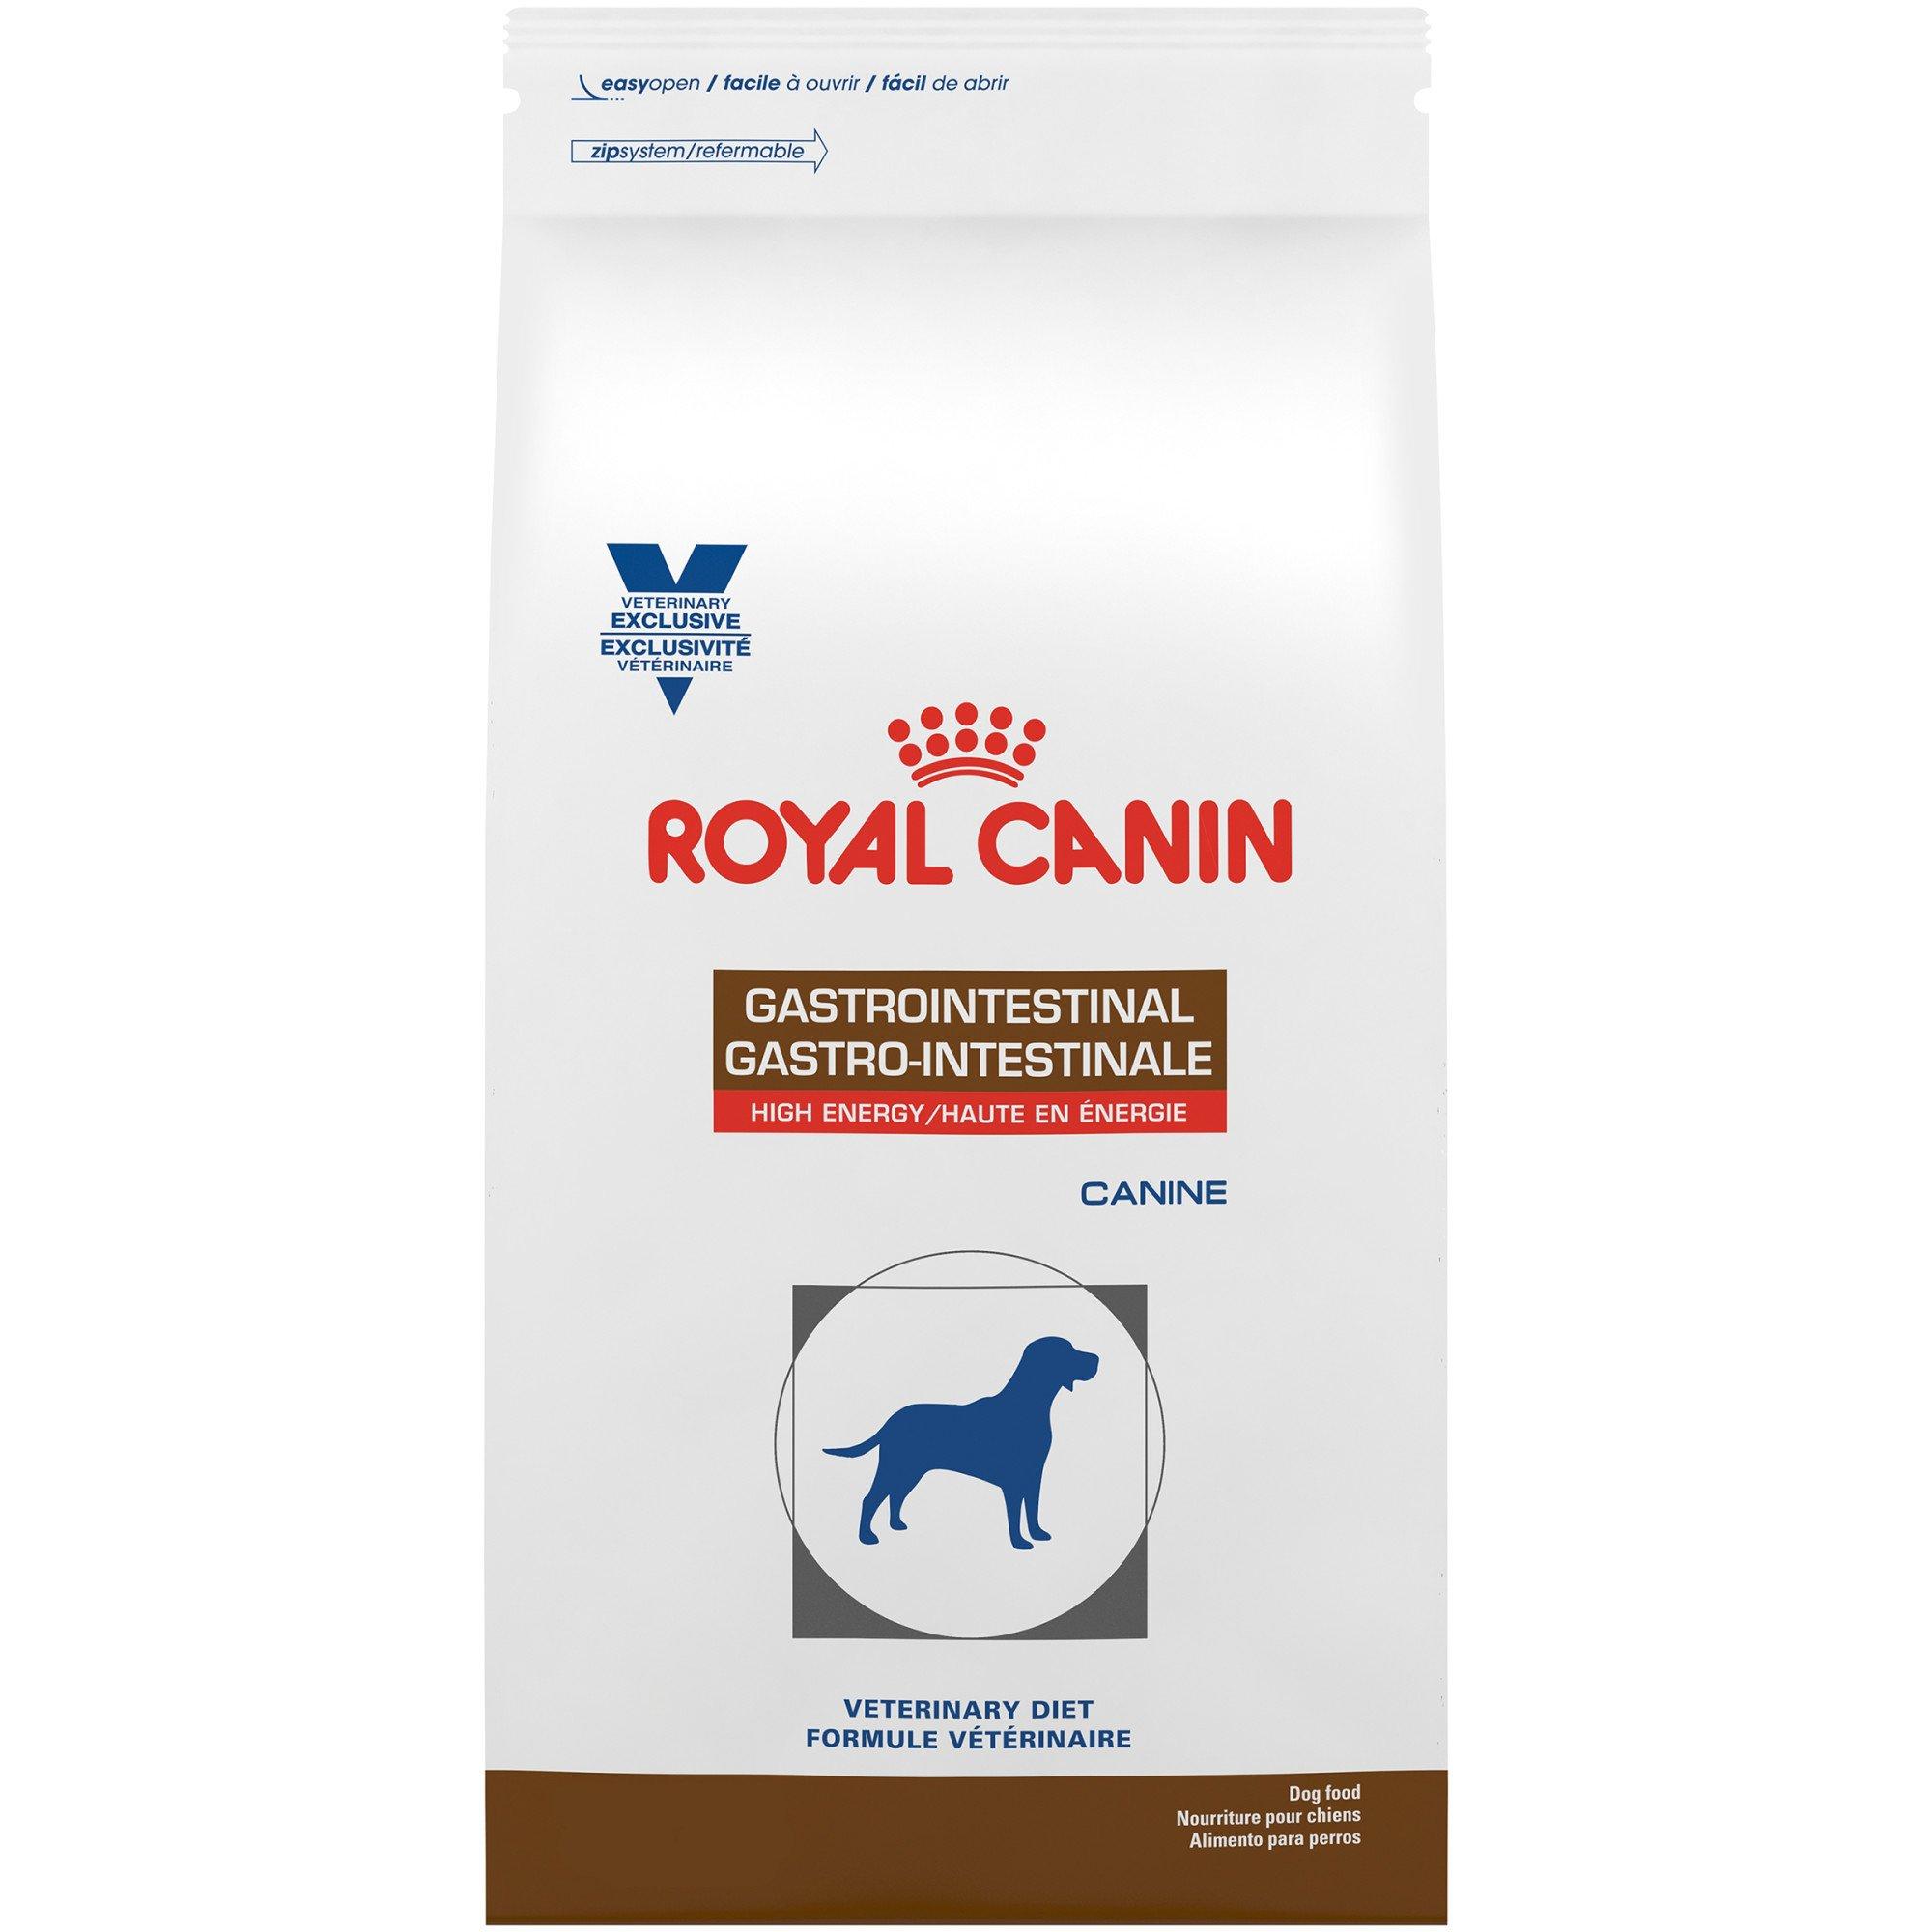 Gastrointestinal High Energy Dog Food